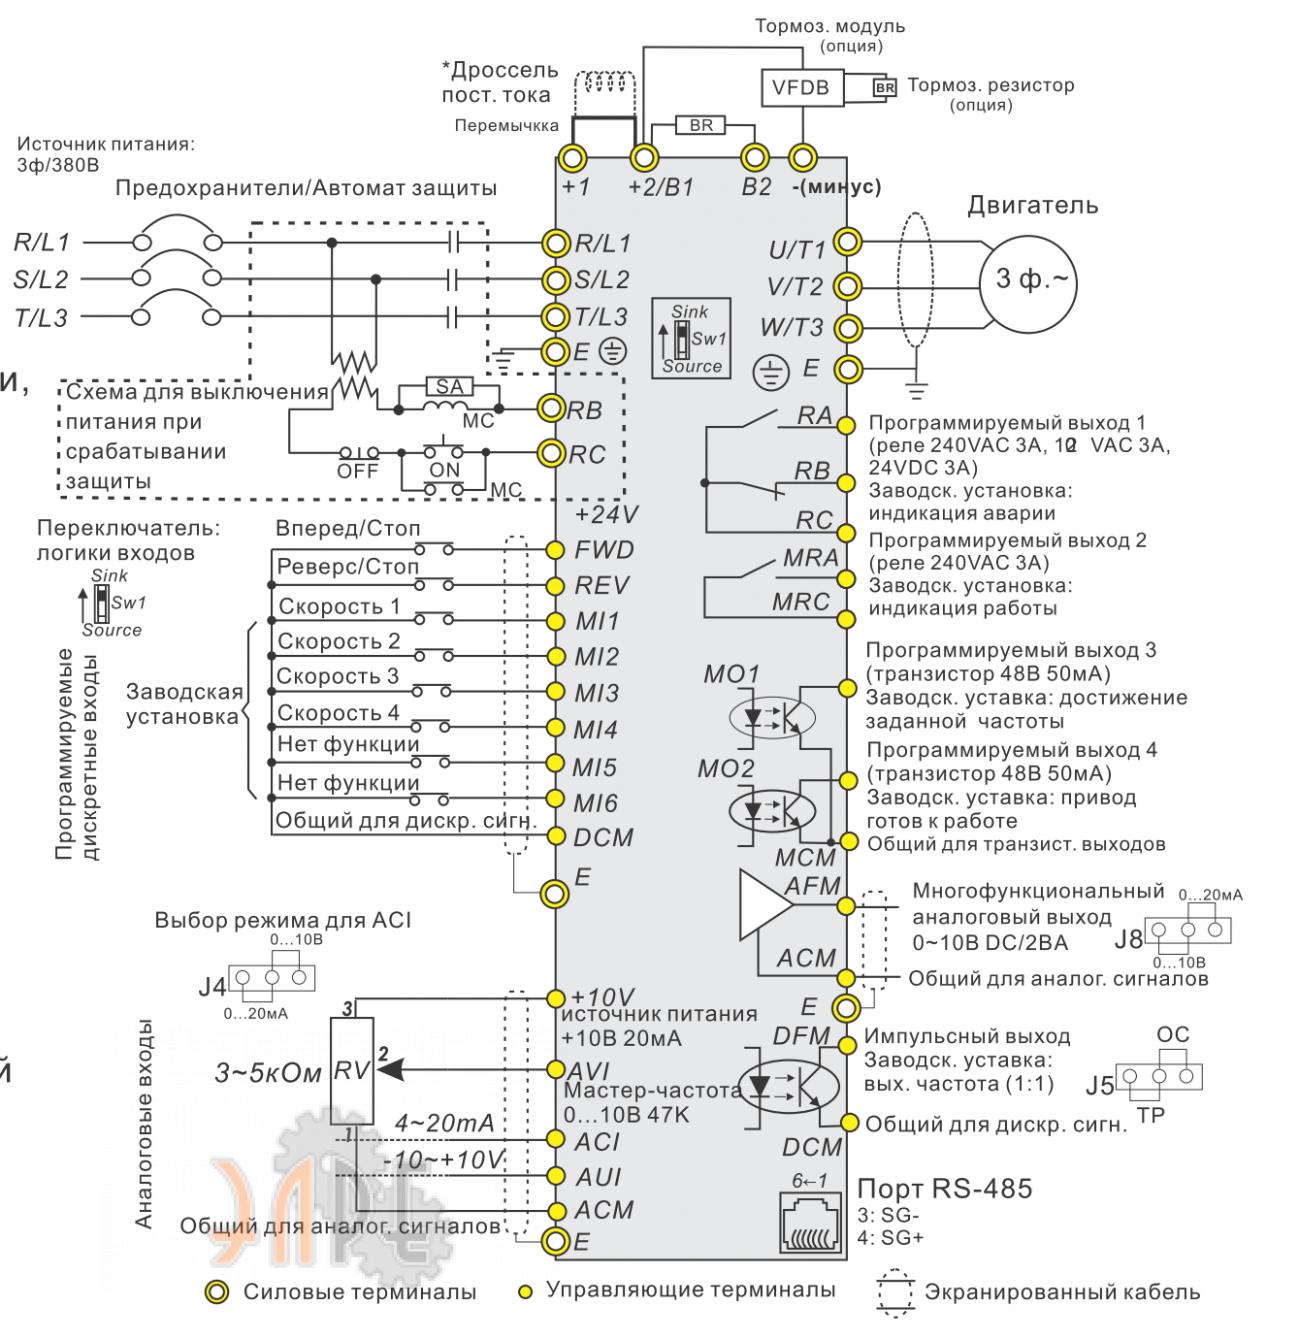 Схема электрического подключения Delta VFD370V43A-2 37,0кВт 3-ф 380В